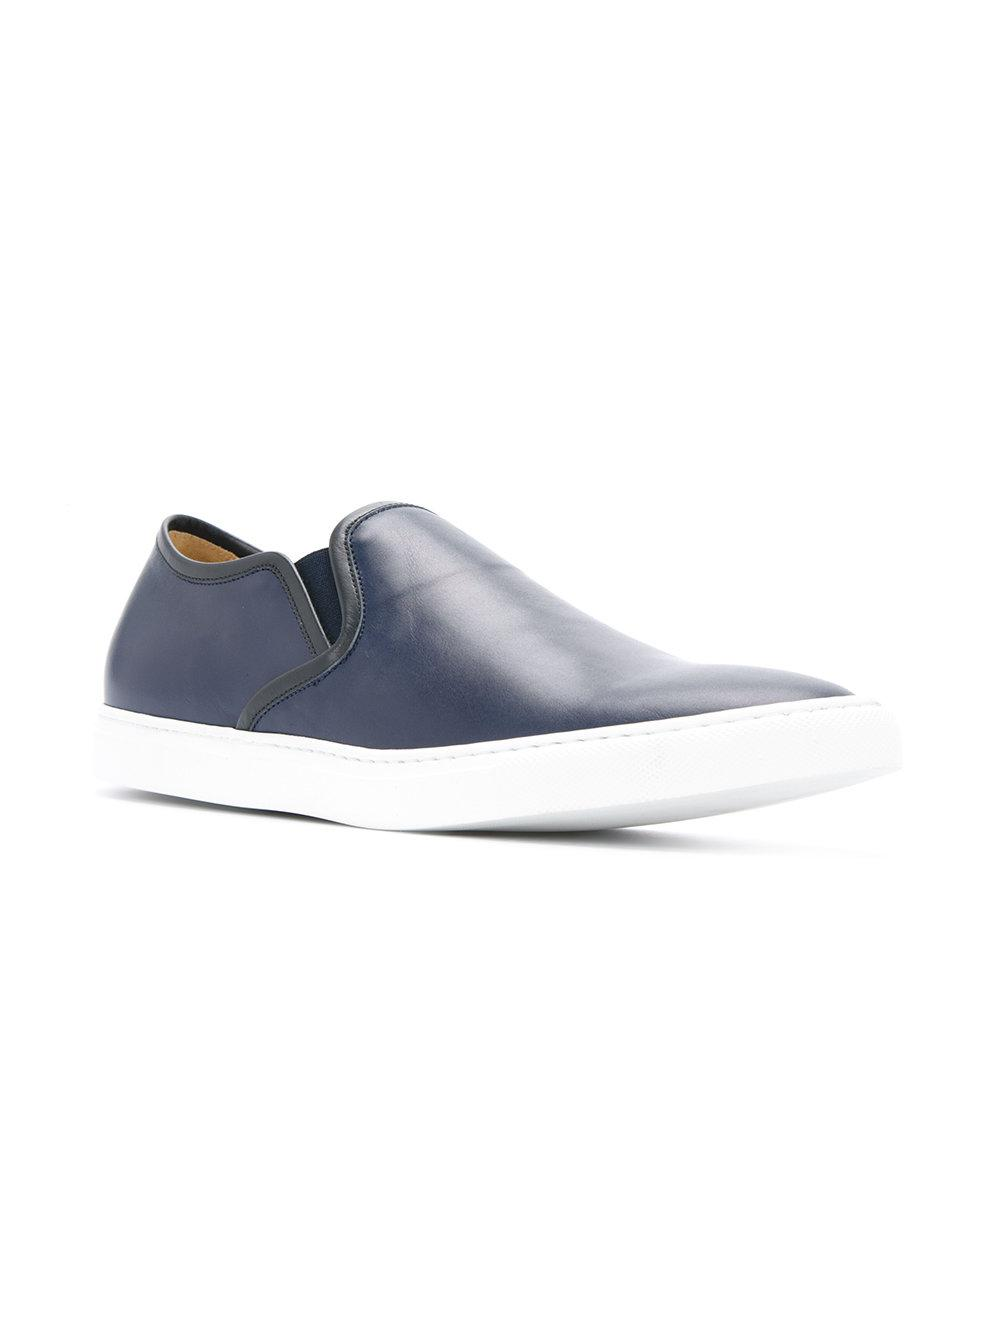 slip-on platform sneakers - White Cerruti pb2OPOJc